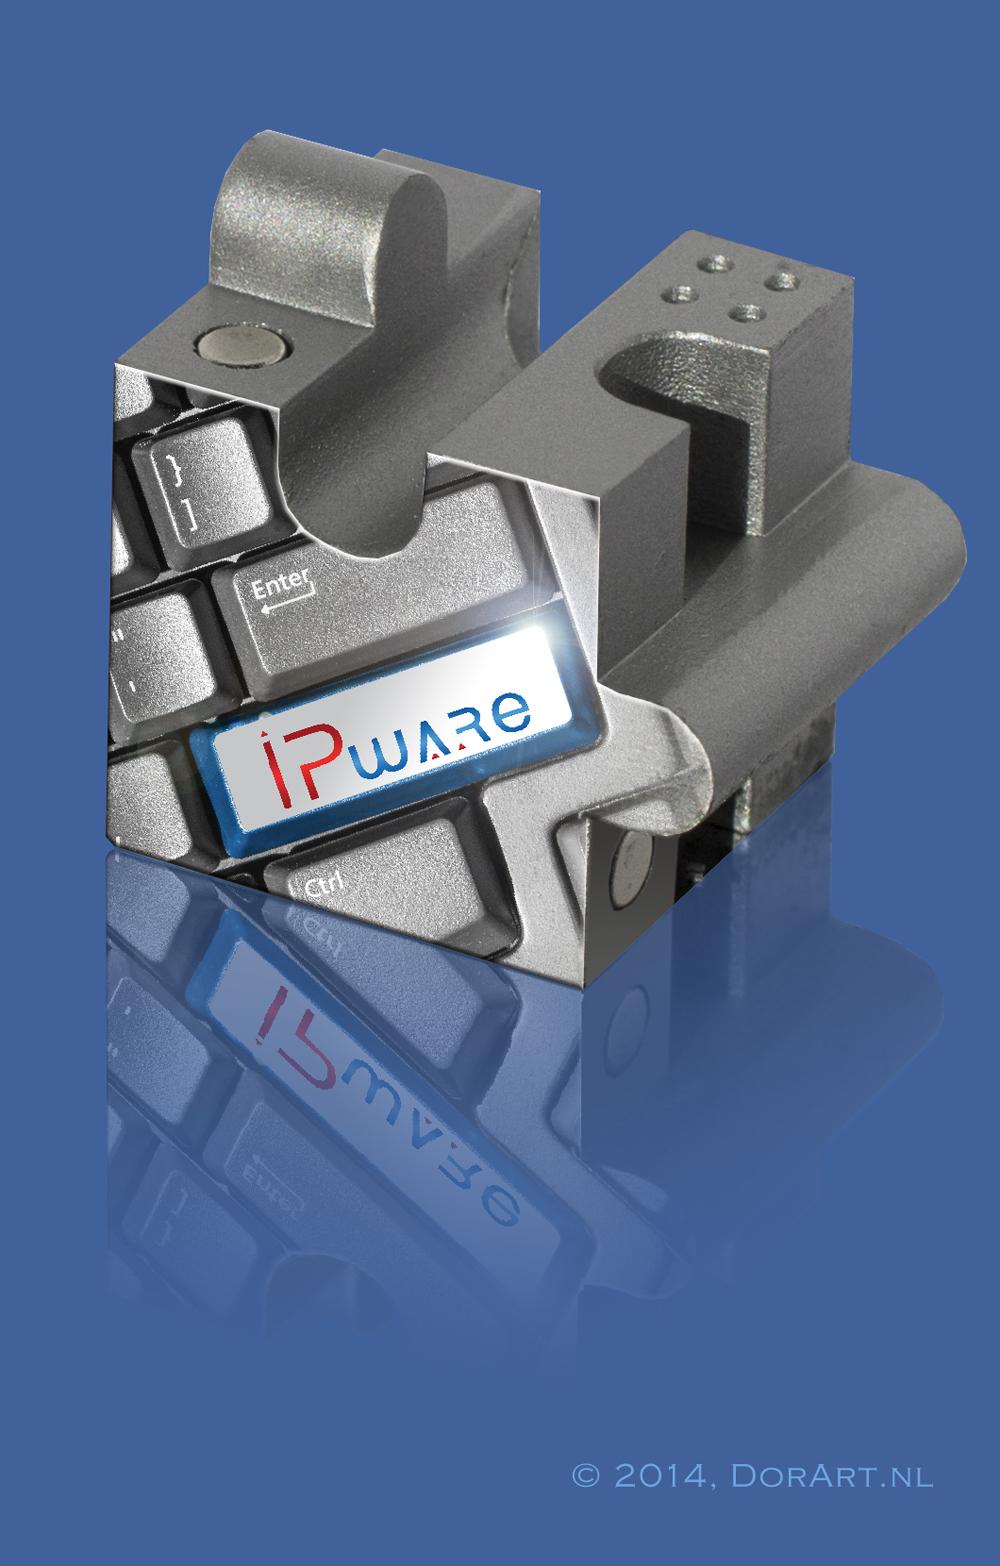 IPware puzzle piece, 2014